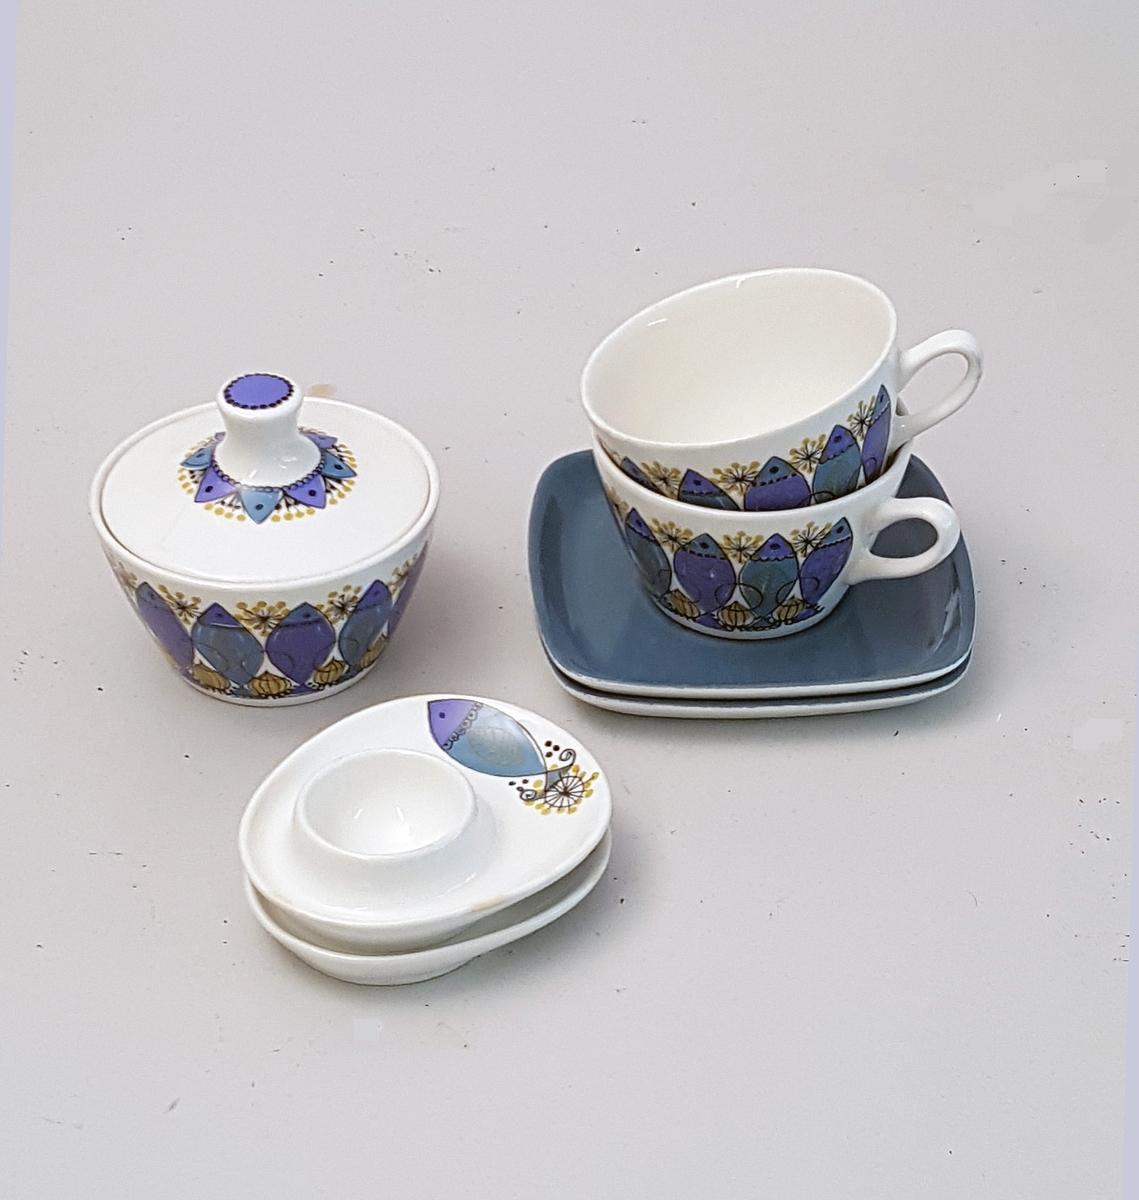 6 koppar - 2 tefat - 6 eggeglas - 1 syltetøyskål Stilisert dekor i motiv av sild